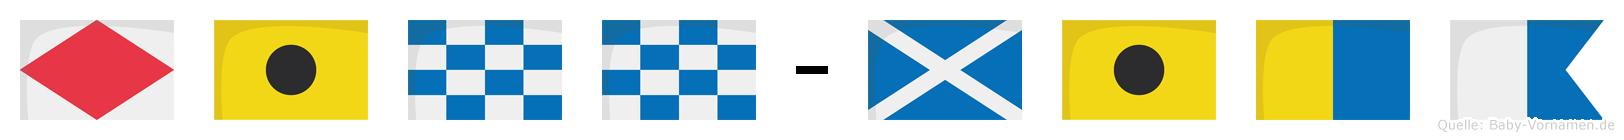 Finn-Mika im Flaggenalphabet